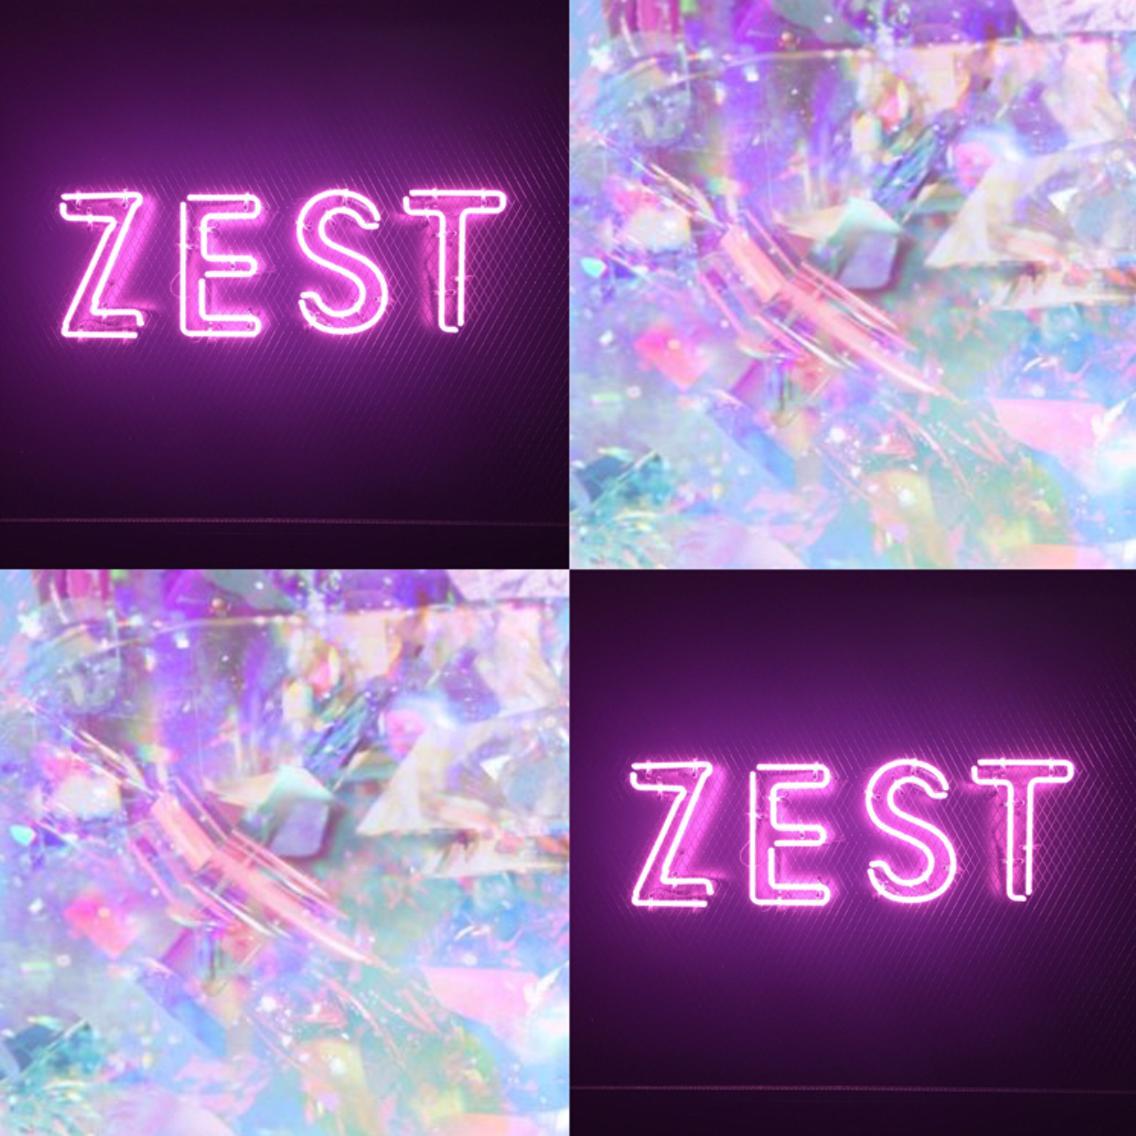 ZEST bis店 minimo特別価格‼︎        新規のお客様 募集中♡♡♡